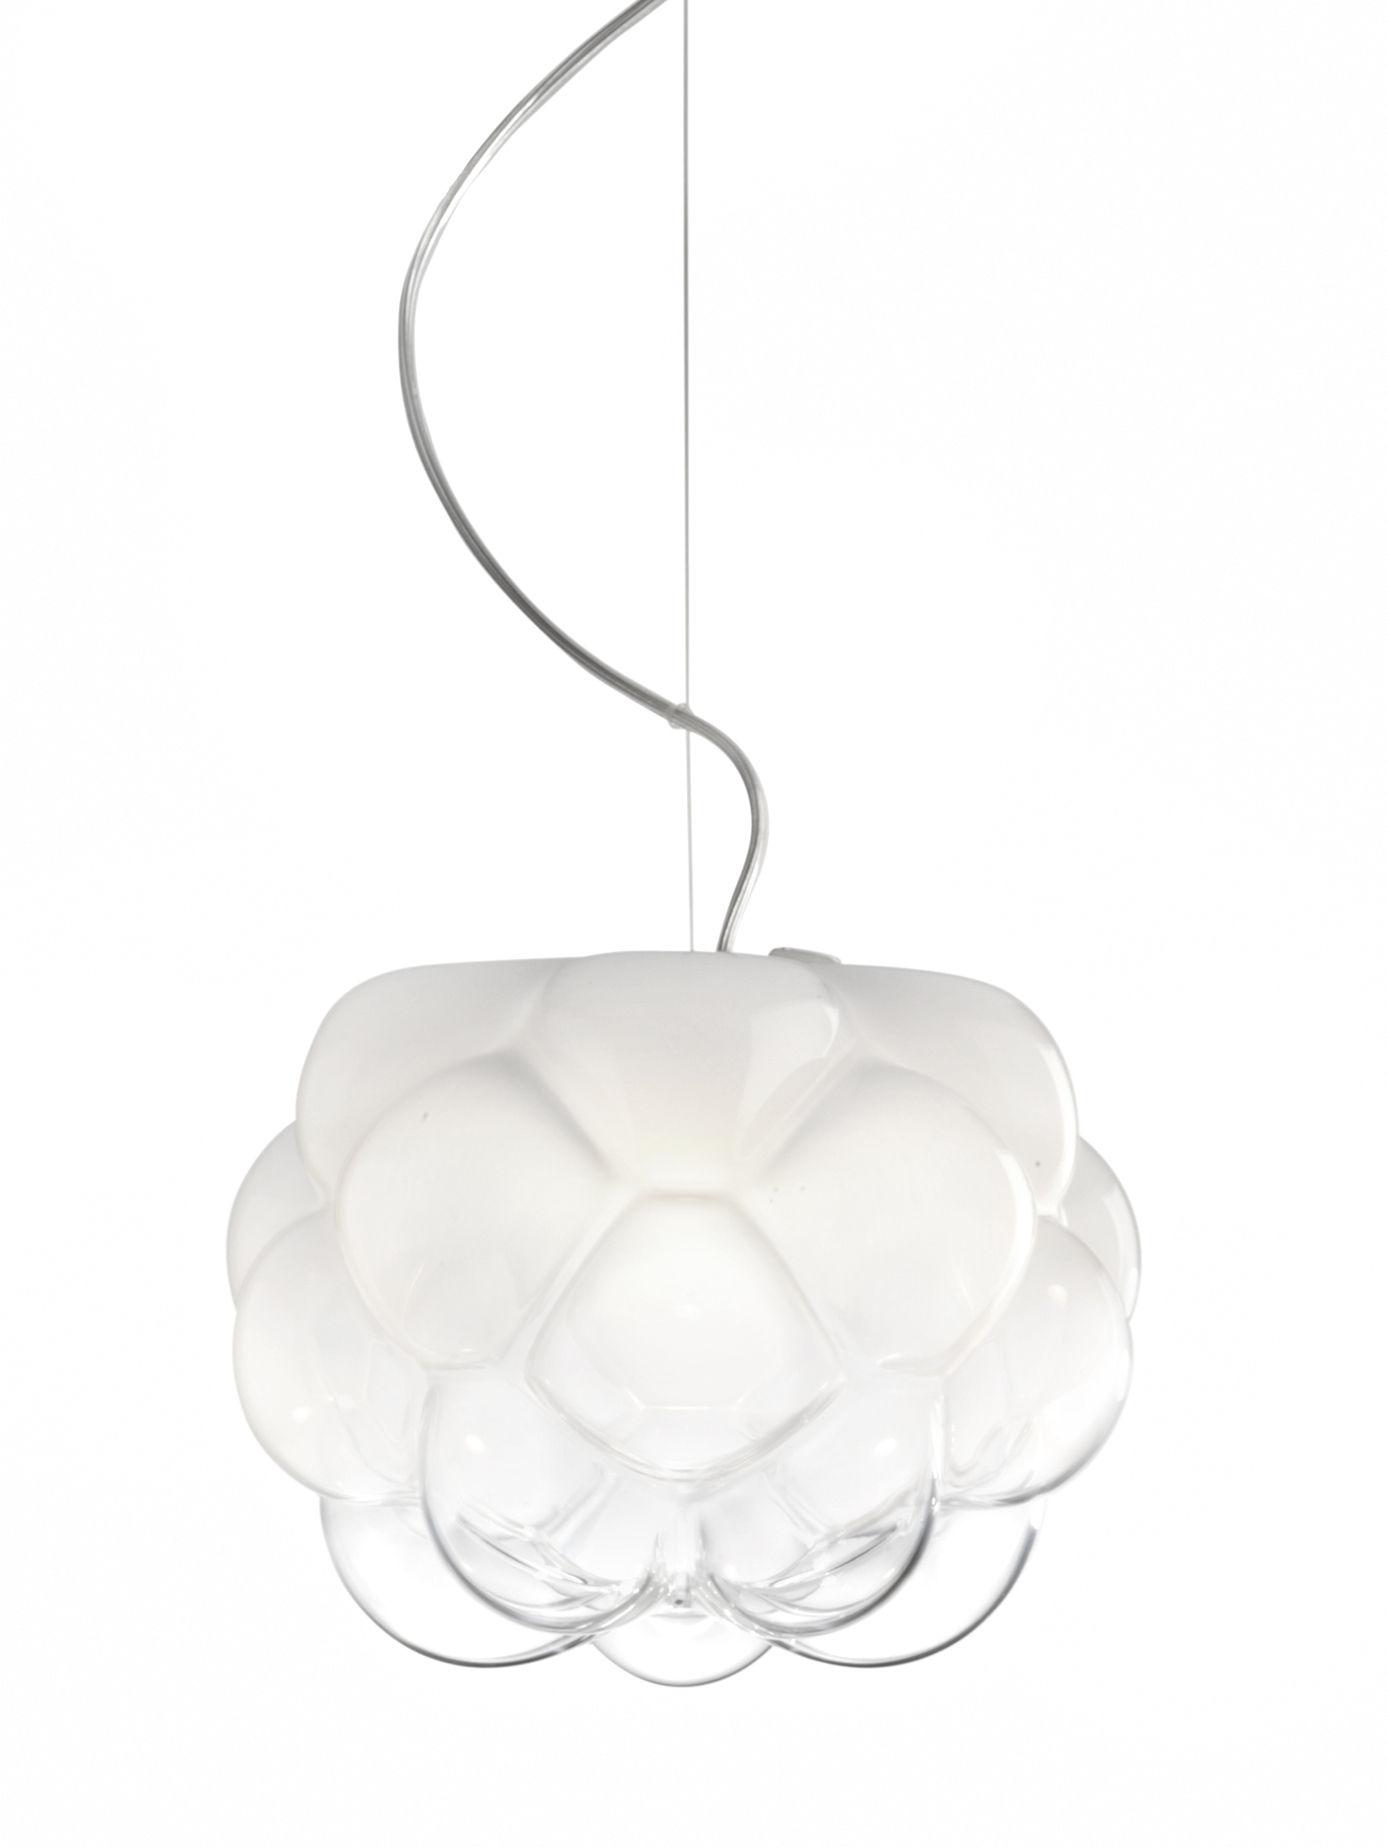 Lighting - Pendant Lighting - Cloudy Pendant by Fabbian - Ø 40 cm / White & transparent - Aluminium, Blown glass